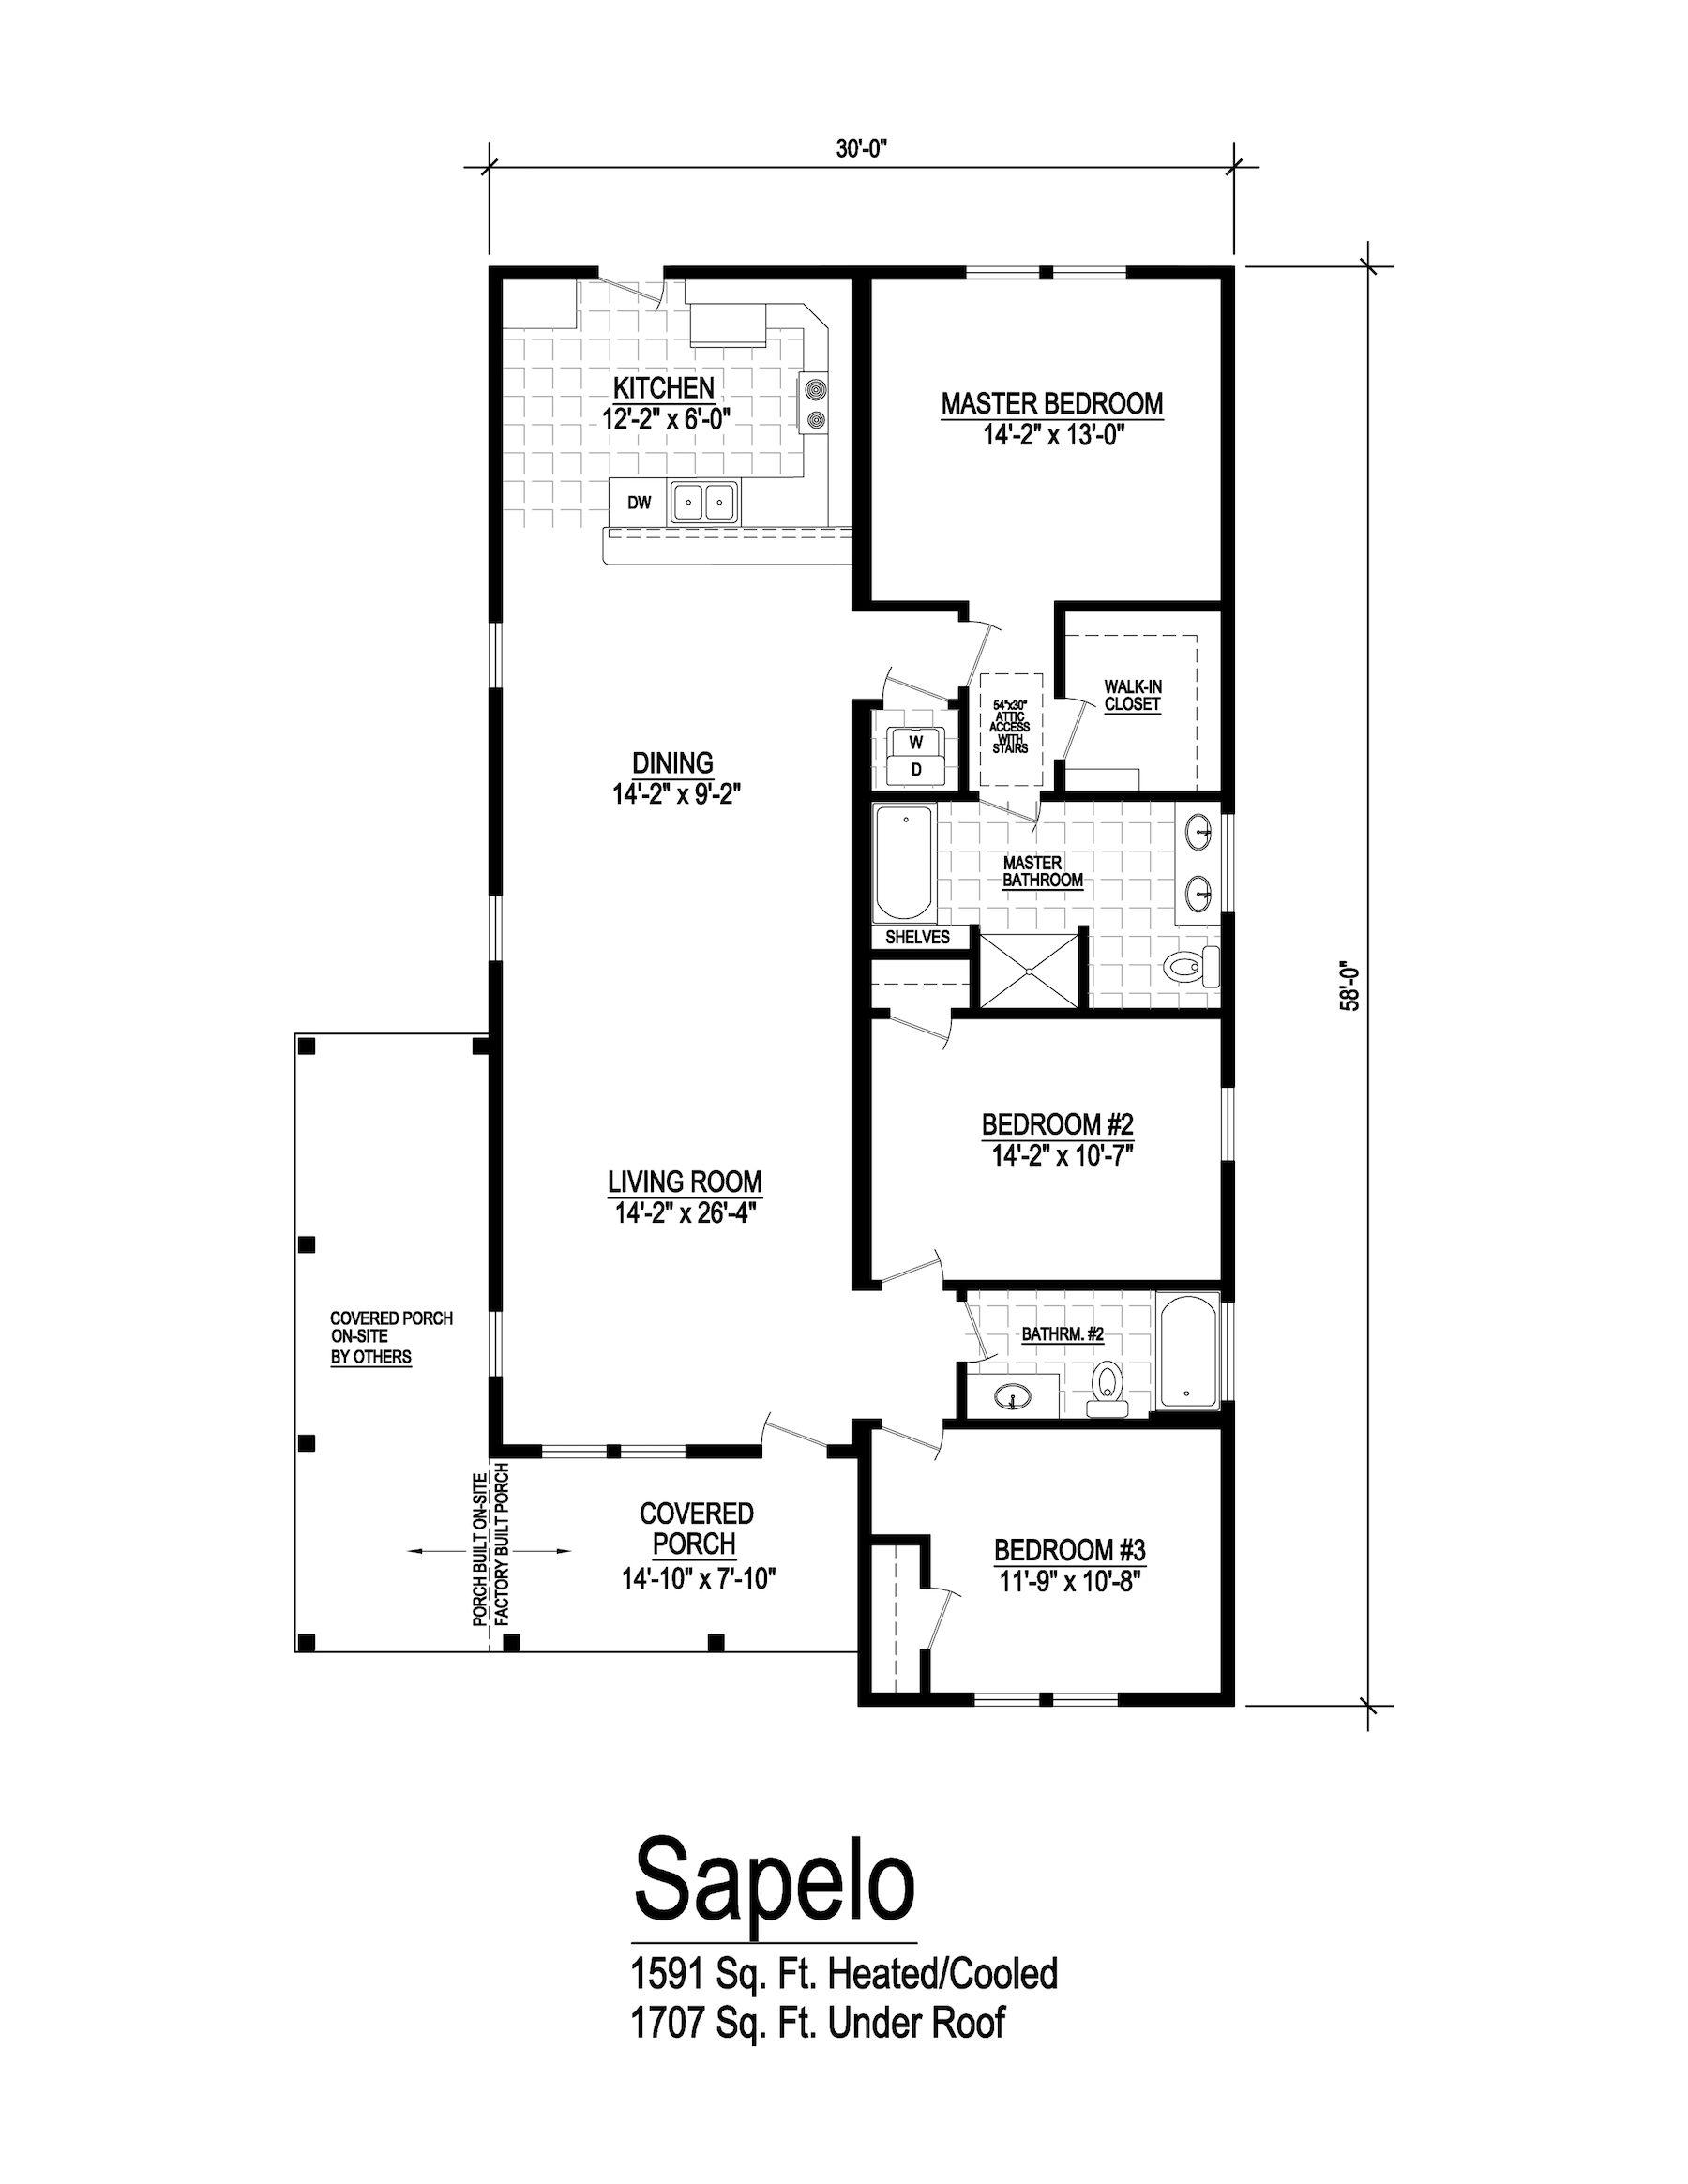 Sapelo Floorplan Building Systems Floor Plans Modular Homes